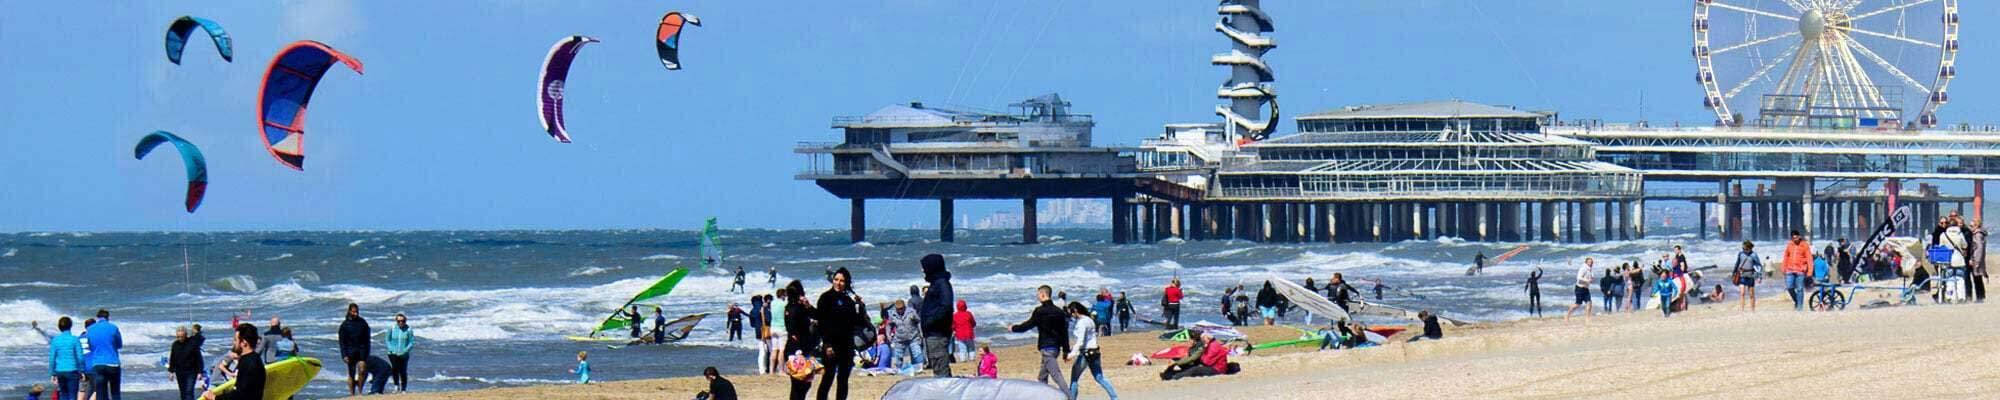 THE HAGUE BEACH STADIUM